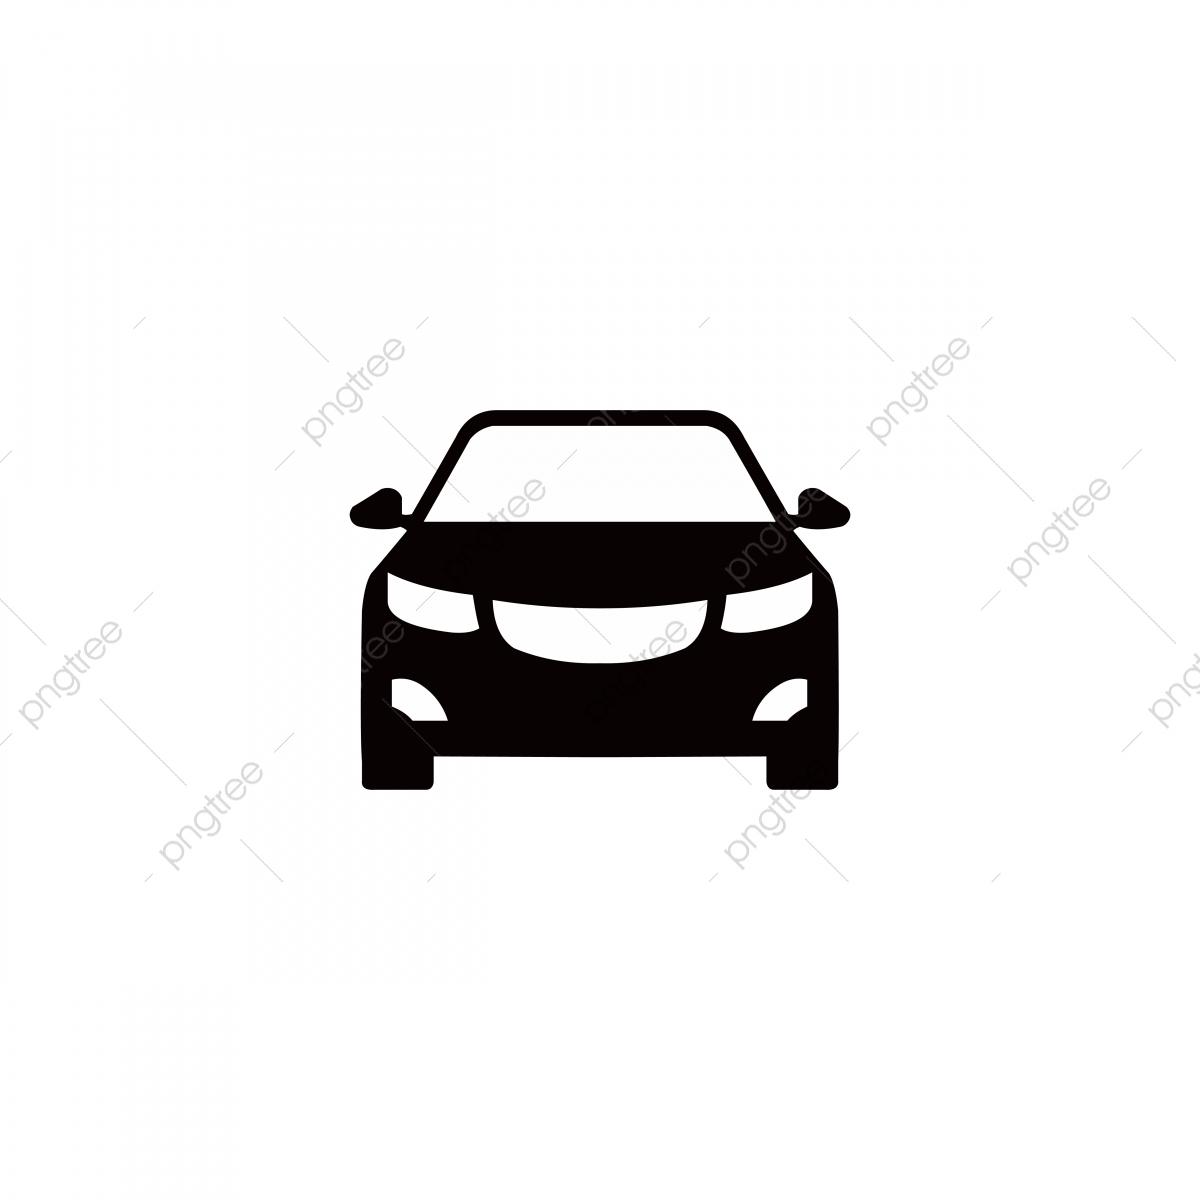 Car Silhouette Vector Sport Car Silhouette Vector, Auto, Automobile.